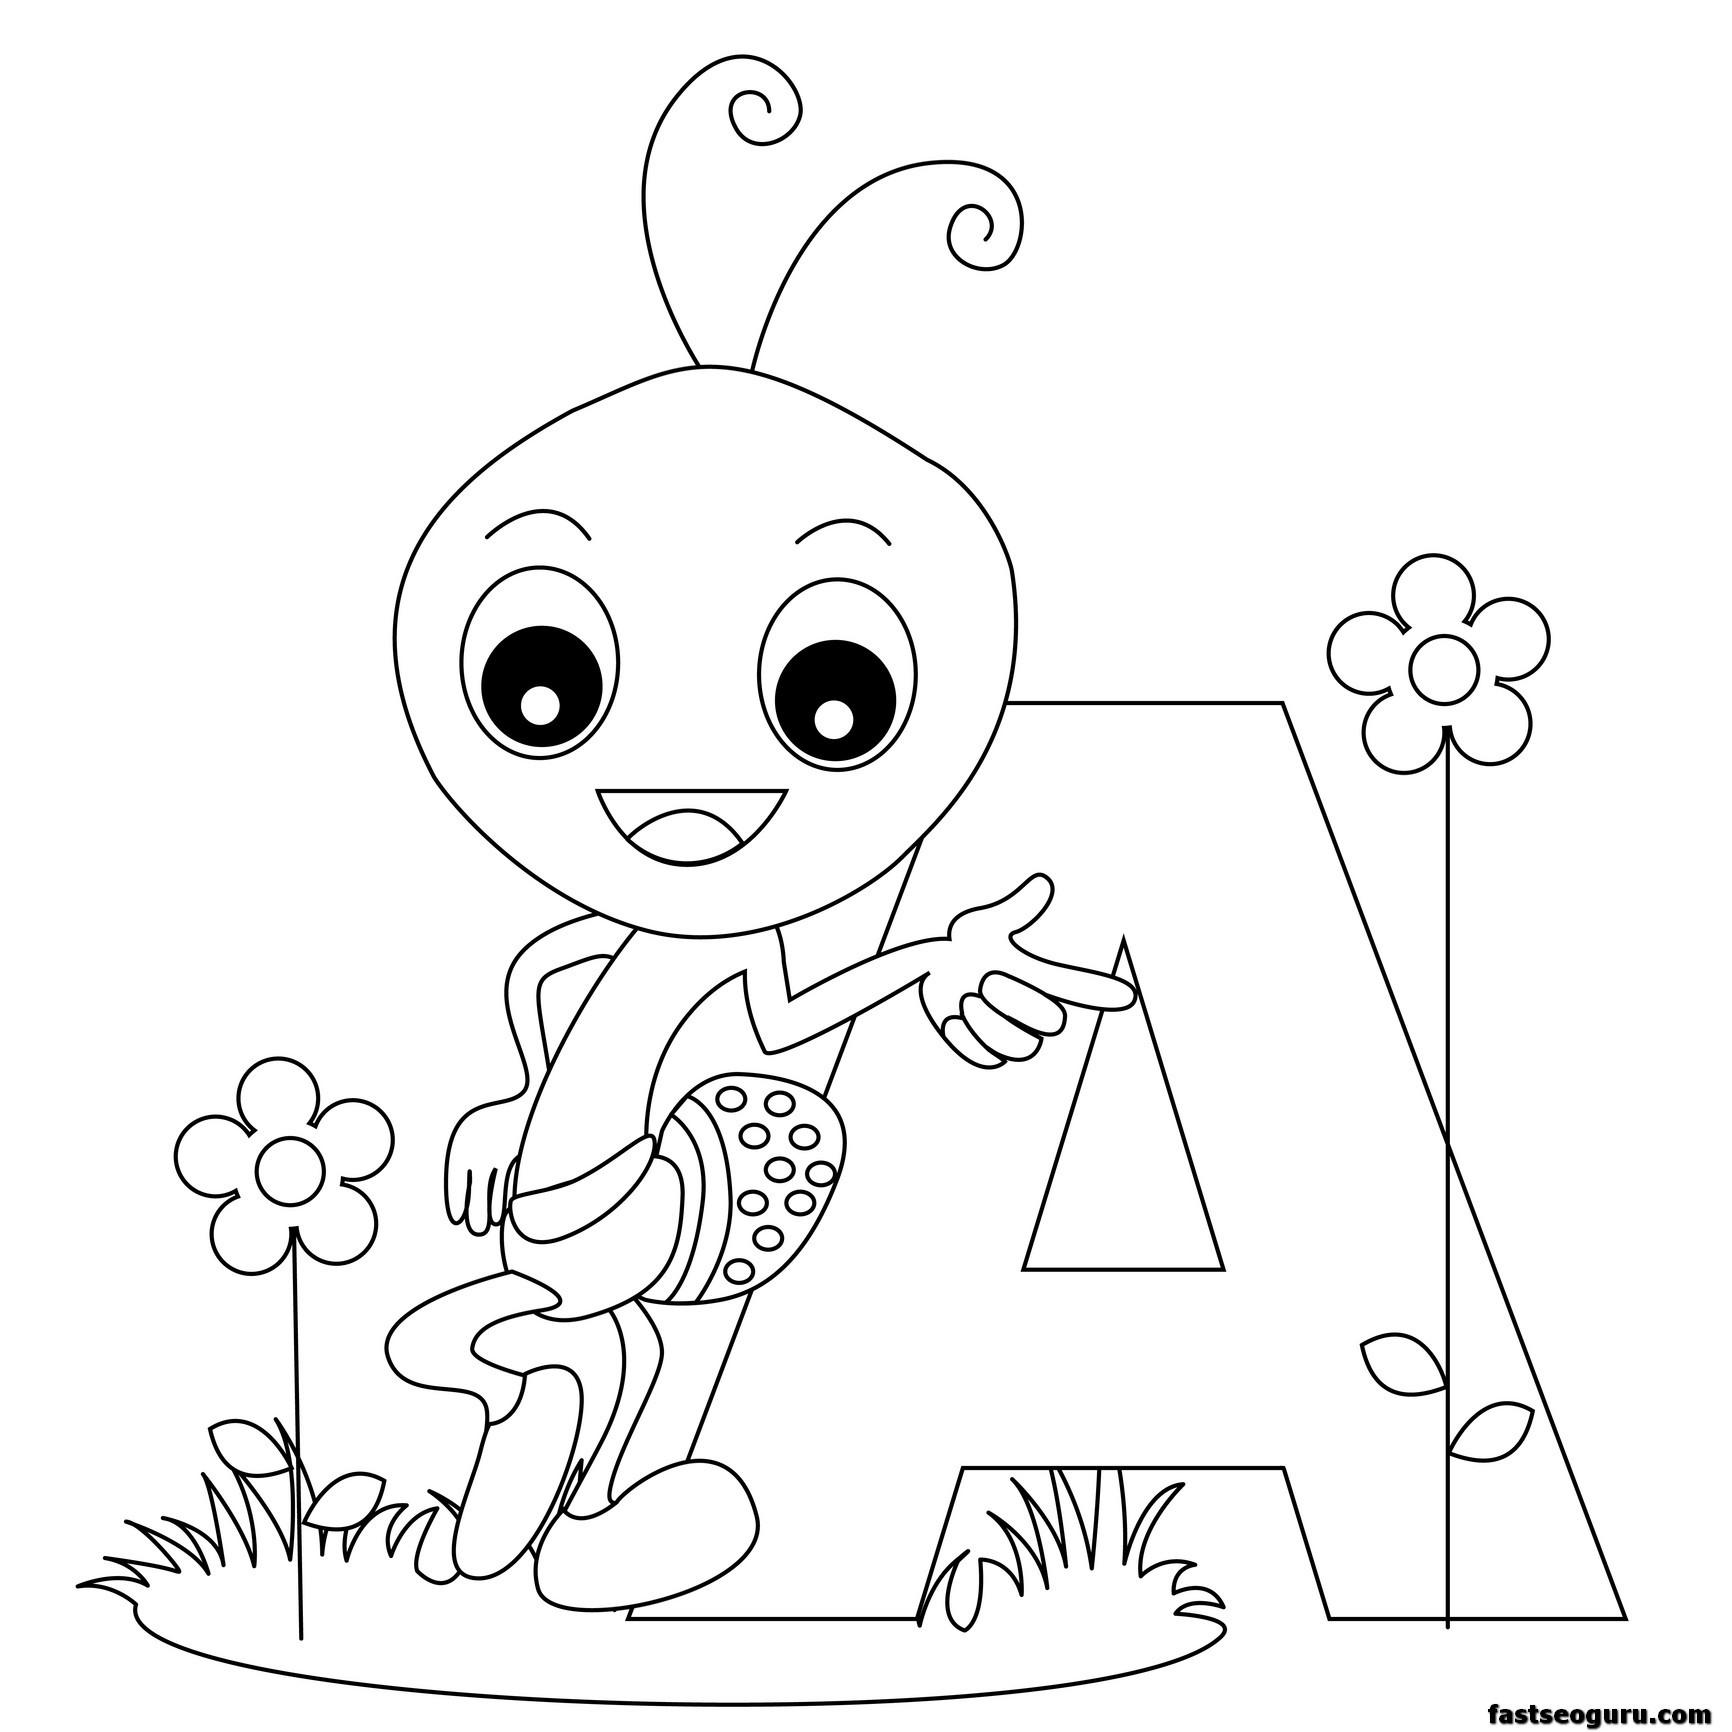 Printable Animal Alphabet Worksheets Letter A For Ant